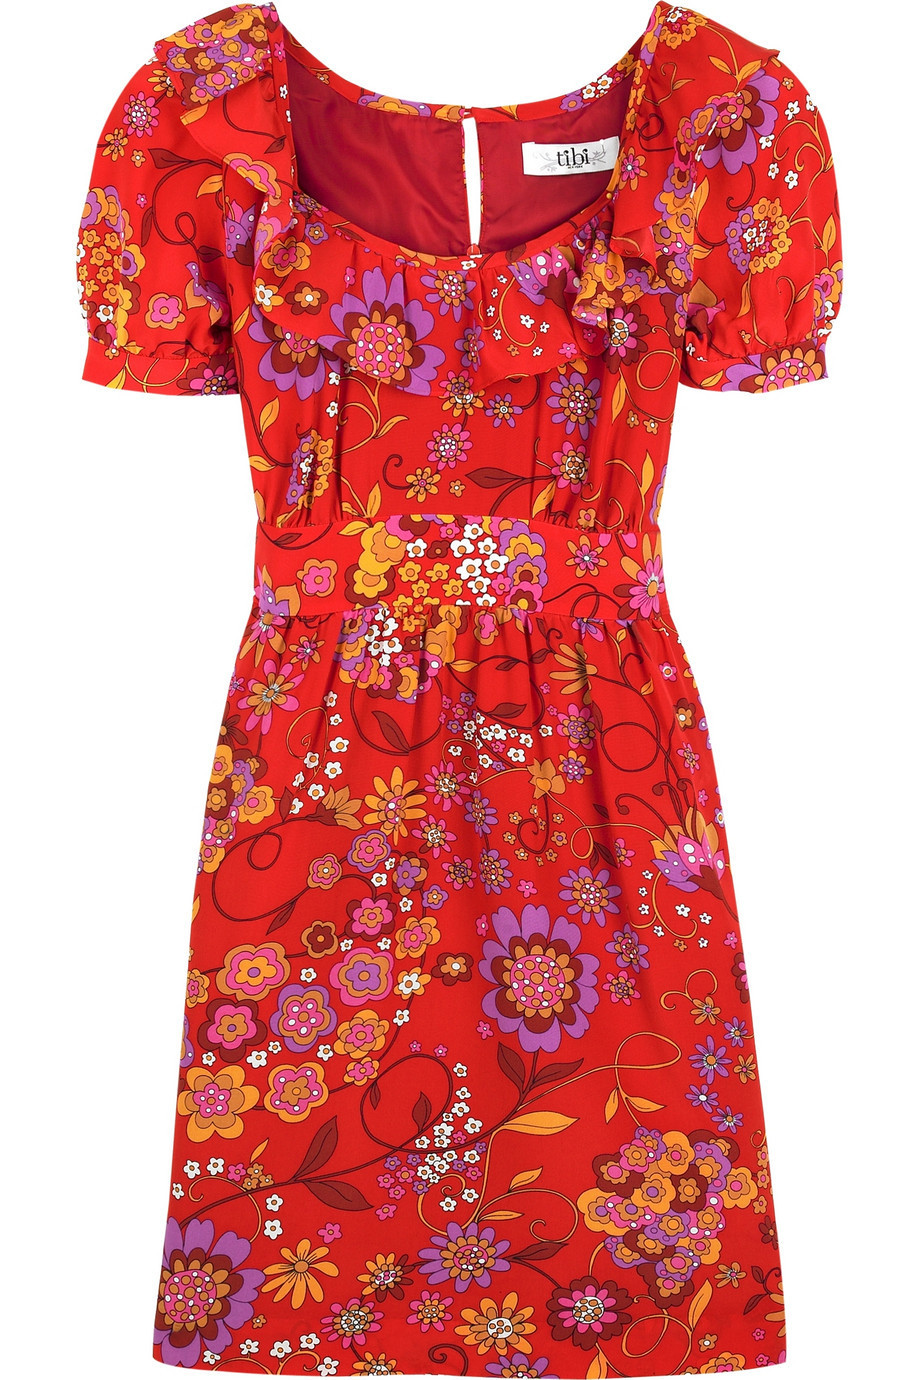 Tibi Secret Garden print dress |NET-A-PORTER.COM from net-a-porter.com